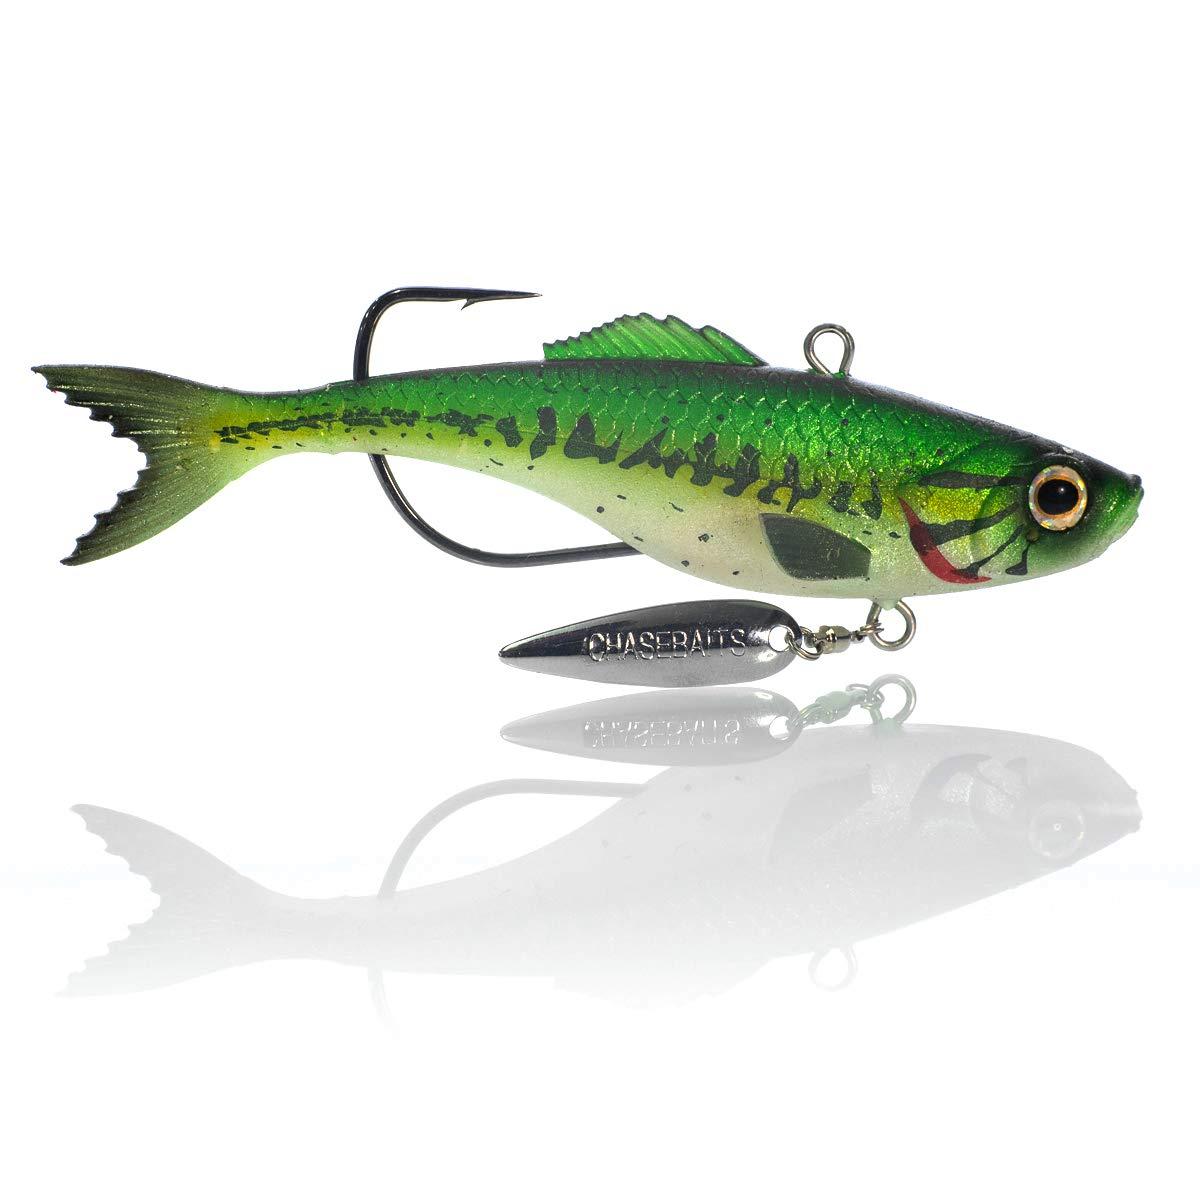 Chasebaits Rip Snorter Fishing Lure